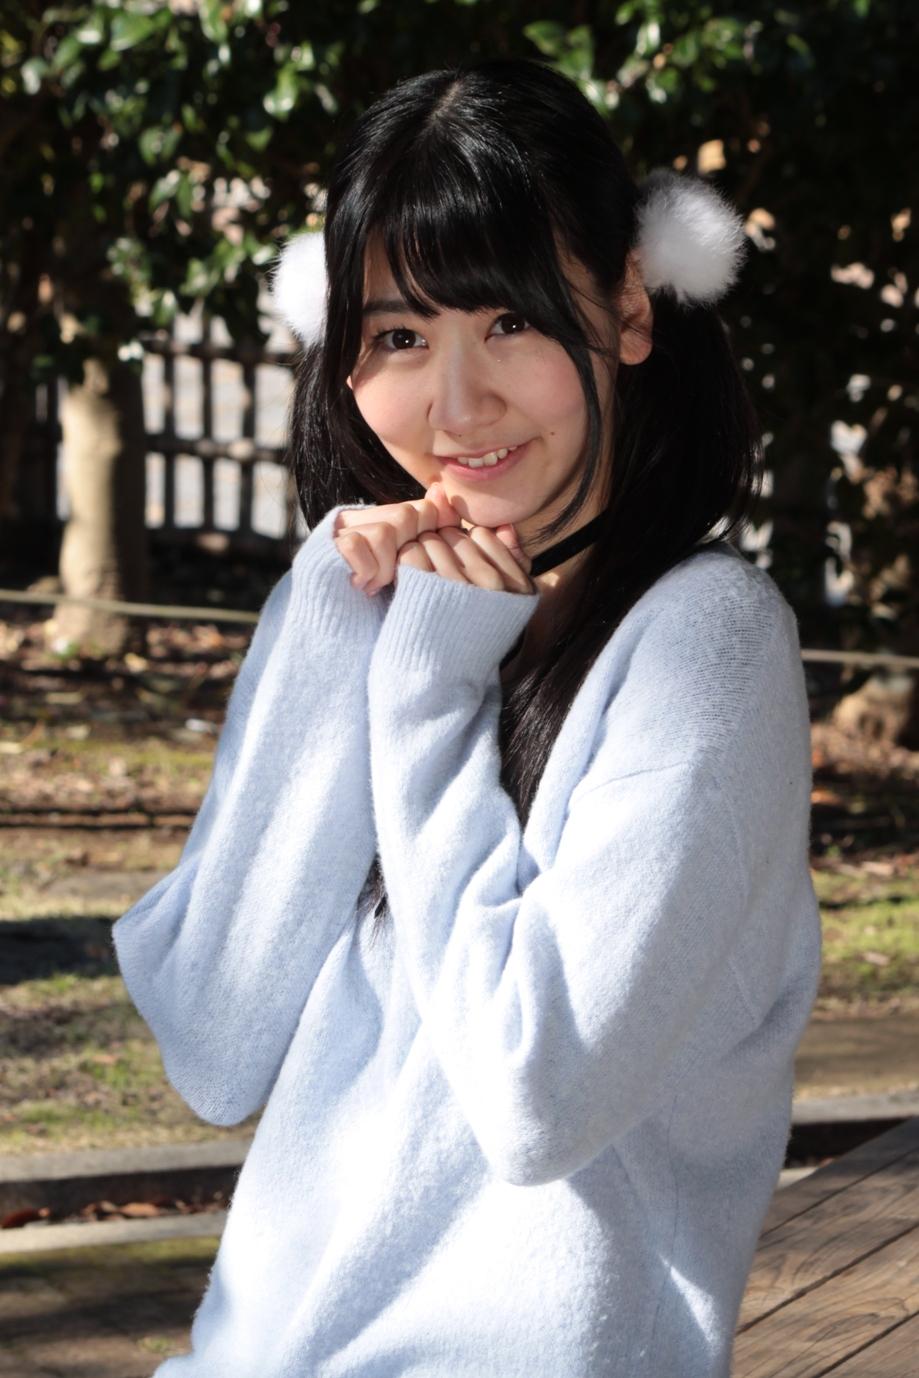 shiiba-taiyoの撮影会ブログ 2014年12月